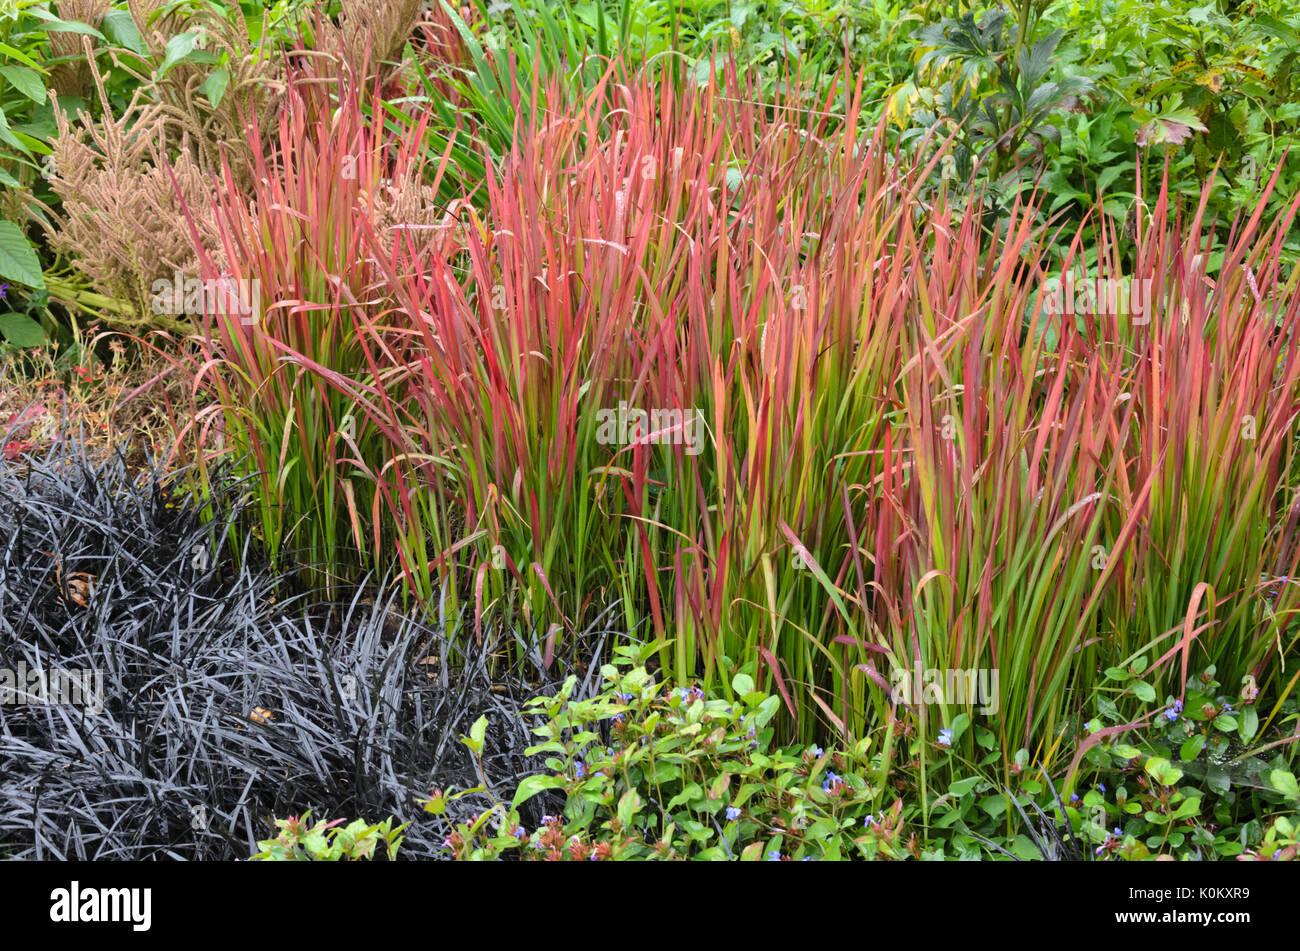 Imperata cylindrica red baron stock photos imperata - Imperata cylindrica red baron ...